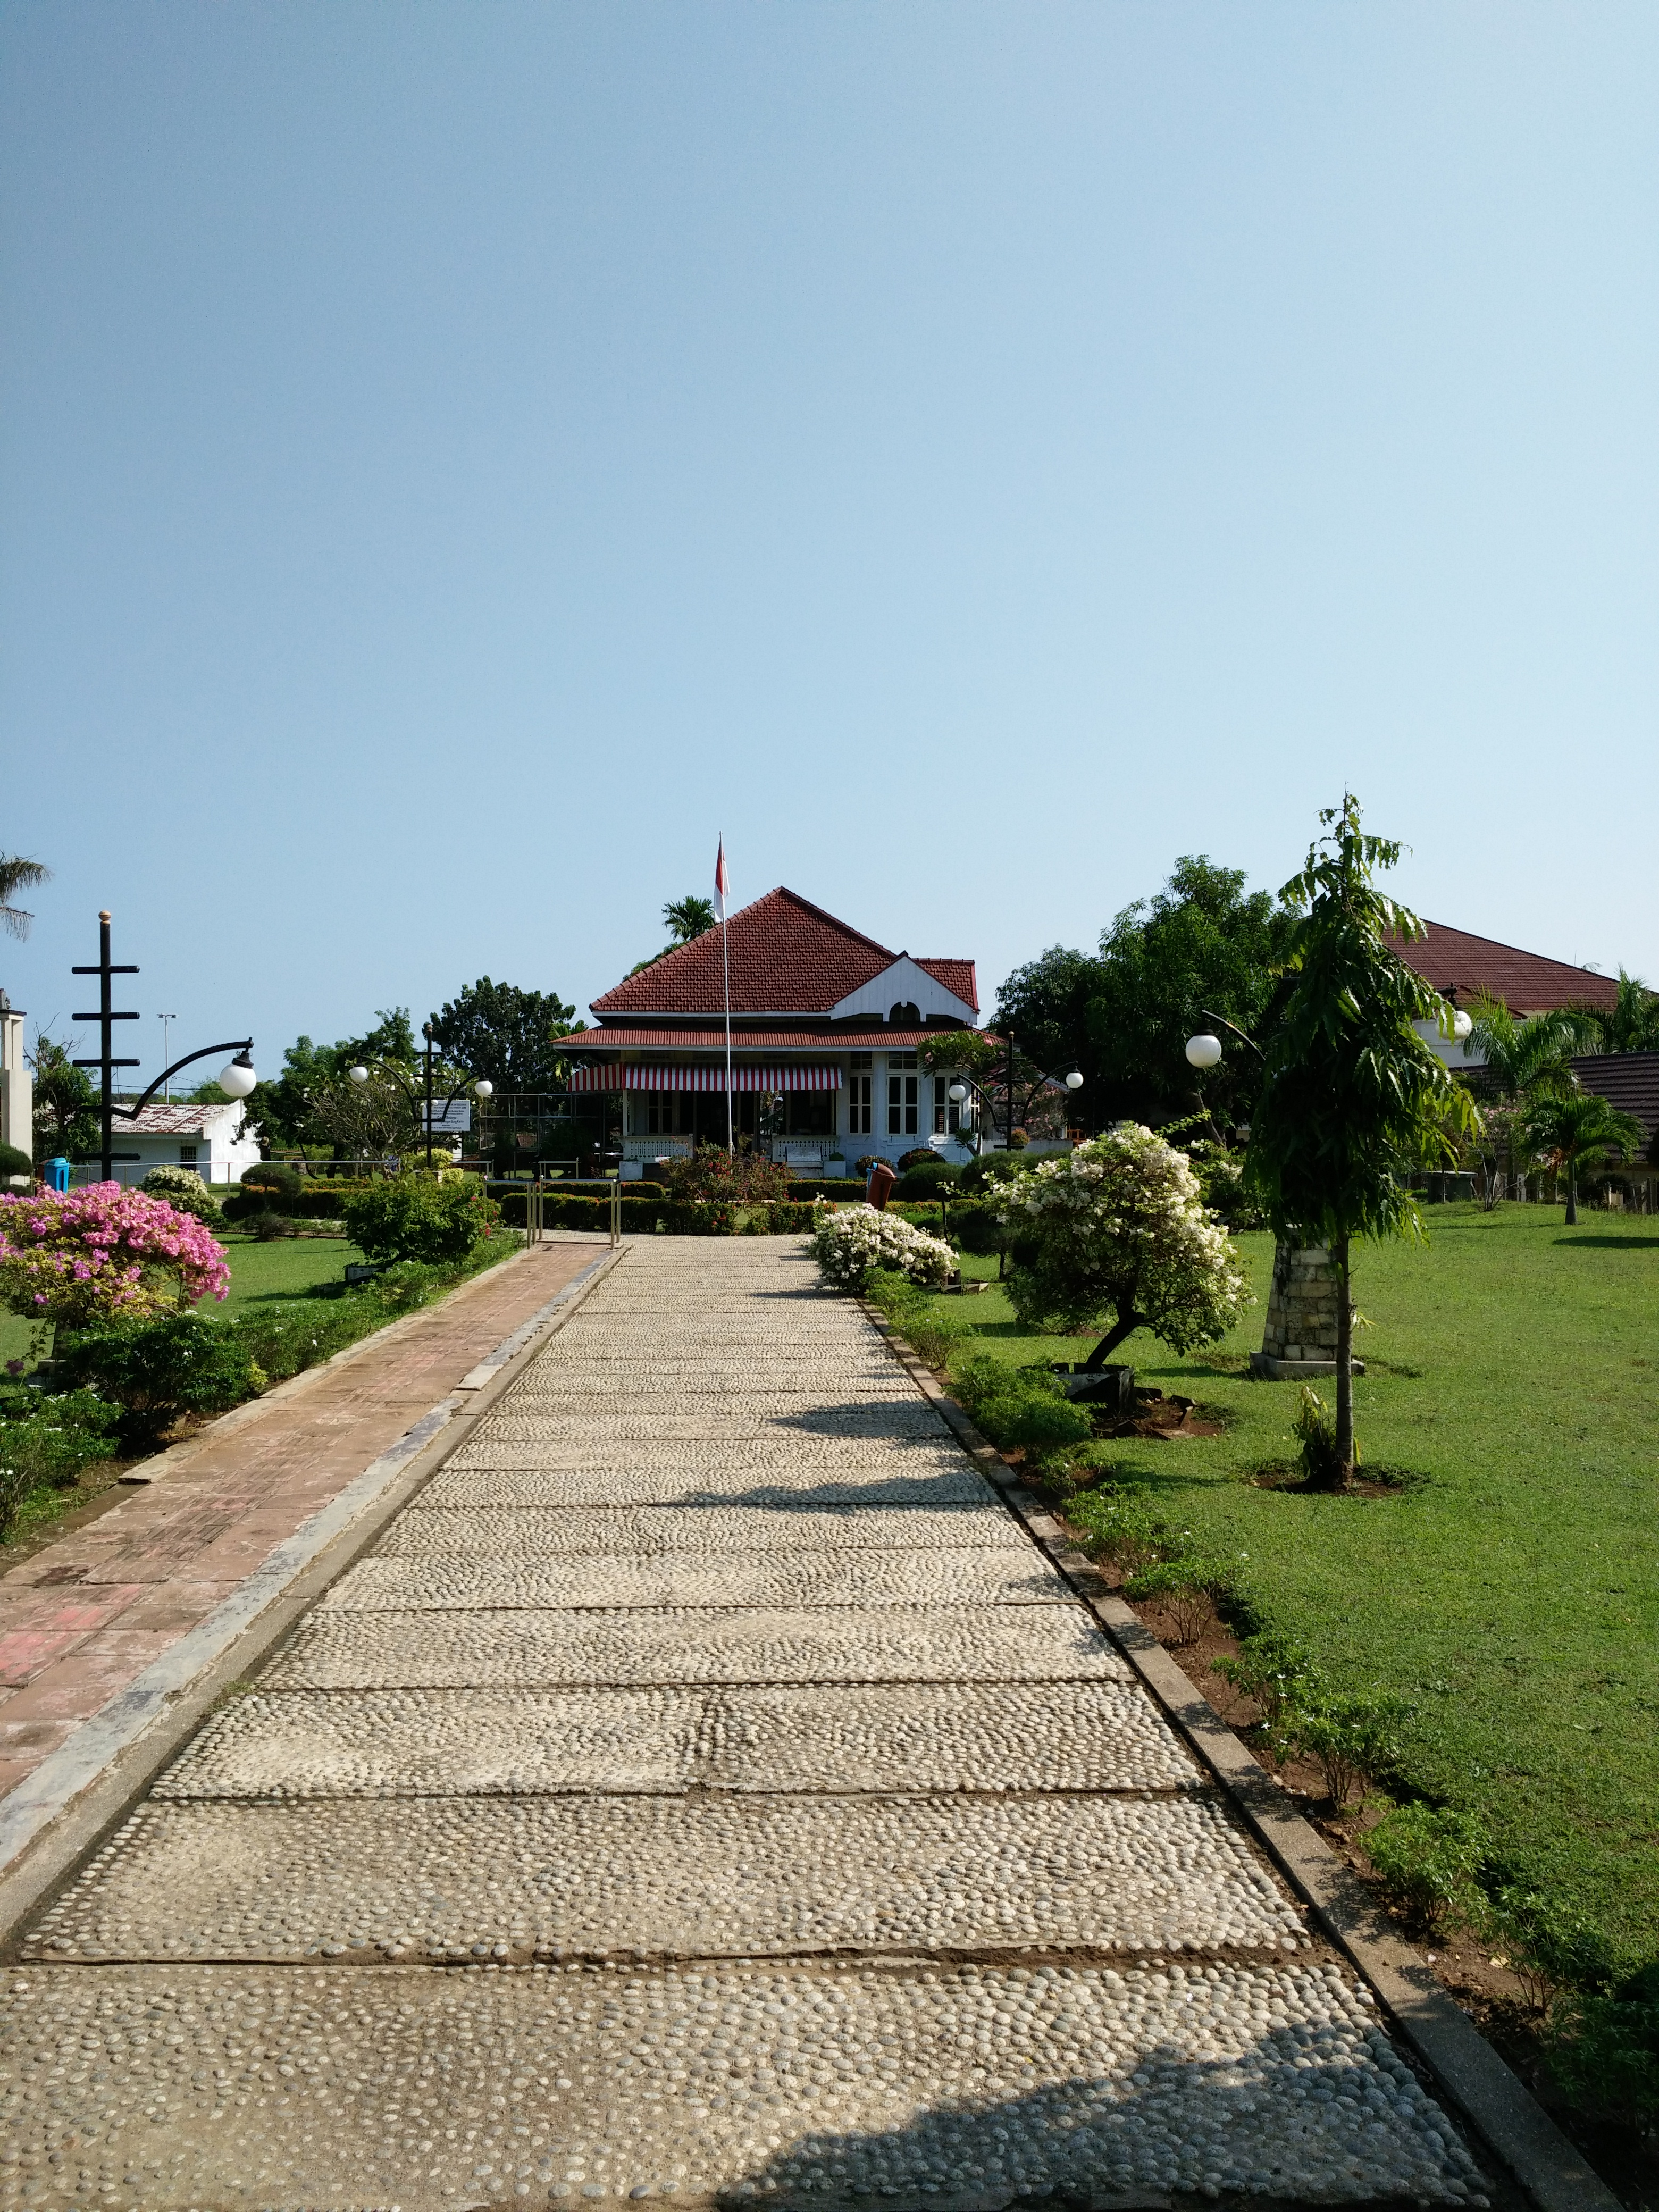 Rumah Pengasingan Sukarno Fadlyrahman Weblog Bung Karno Kota Bengkulu